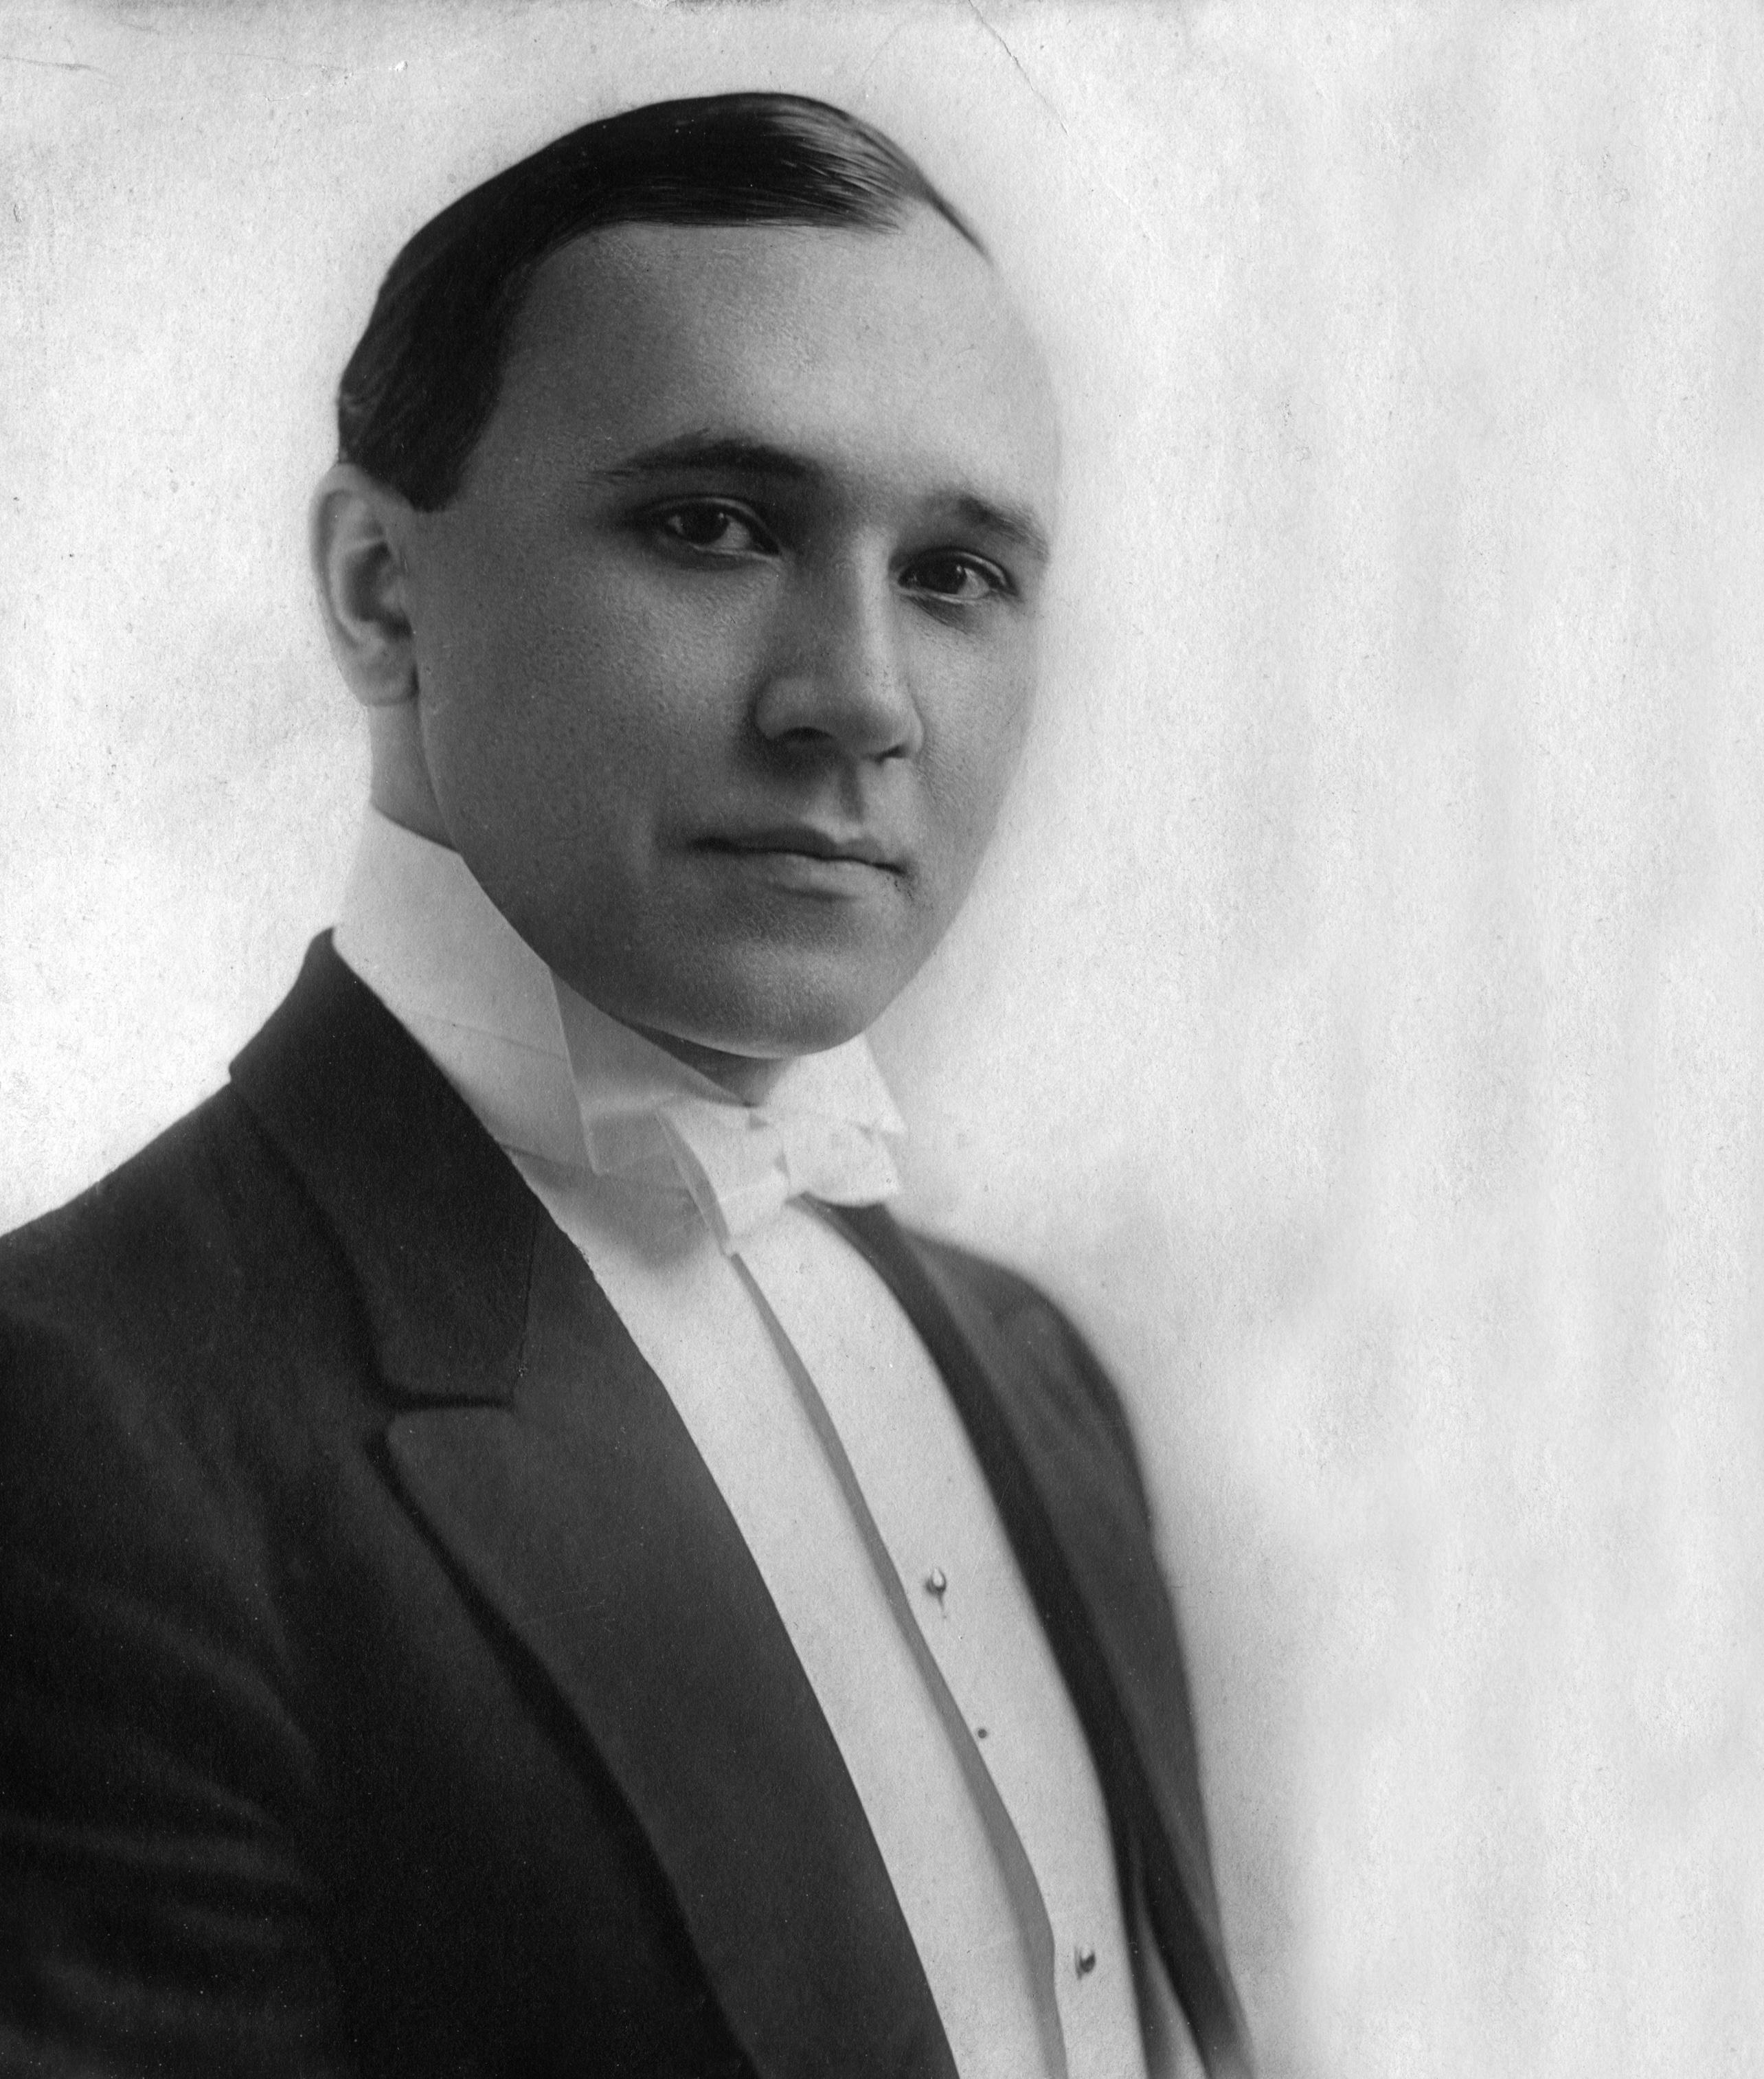 Composer Eustasio Rosales